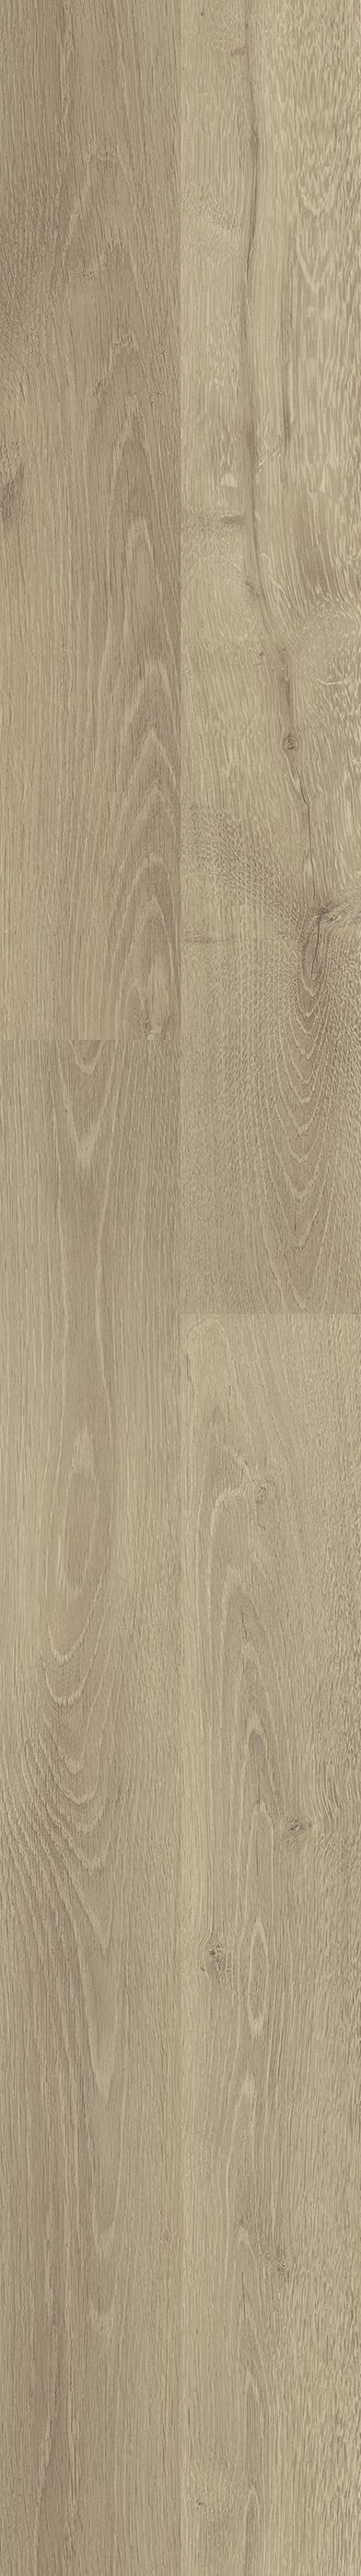 Kronotex dynamic plus luxury oak silver d 4155 from kronotex for Kronotex laminate flooring distributors